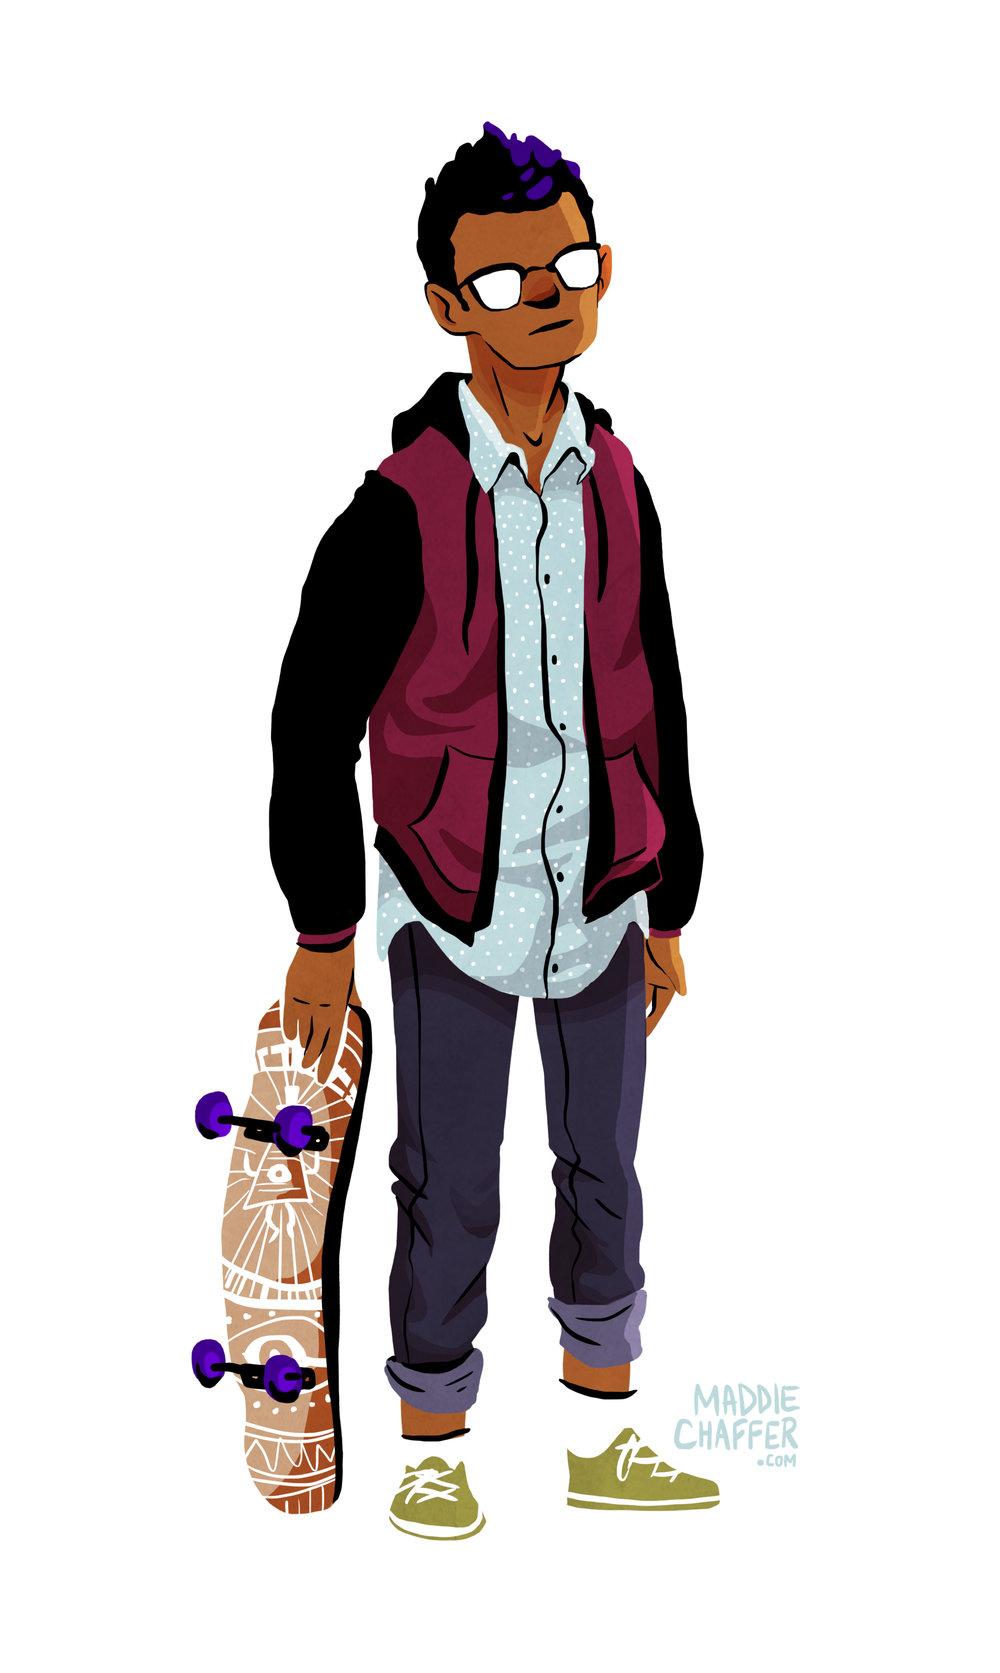 skateboardguy.jpg